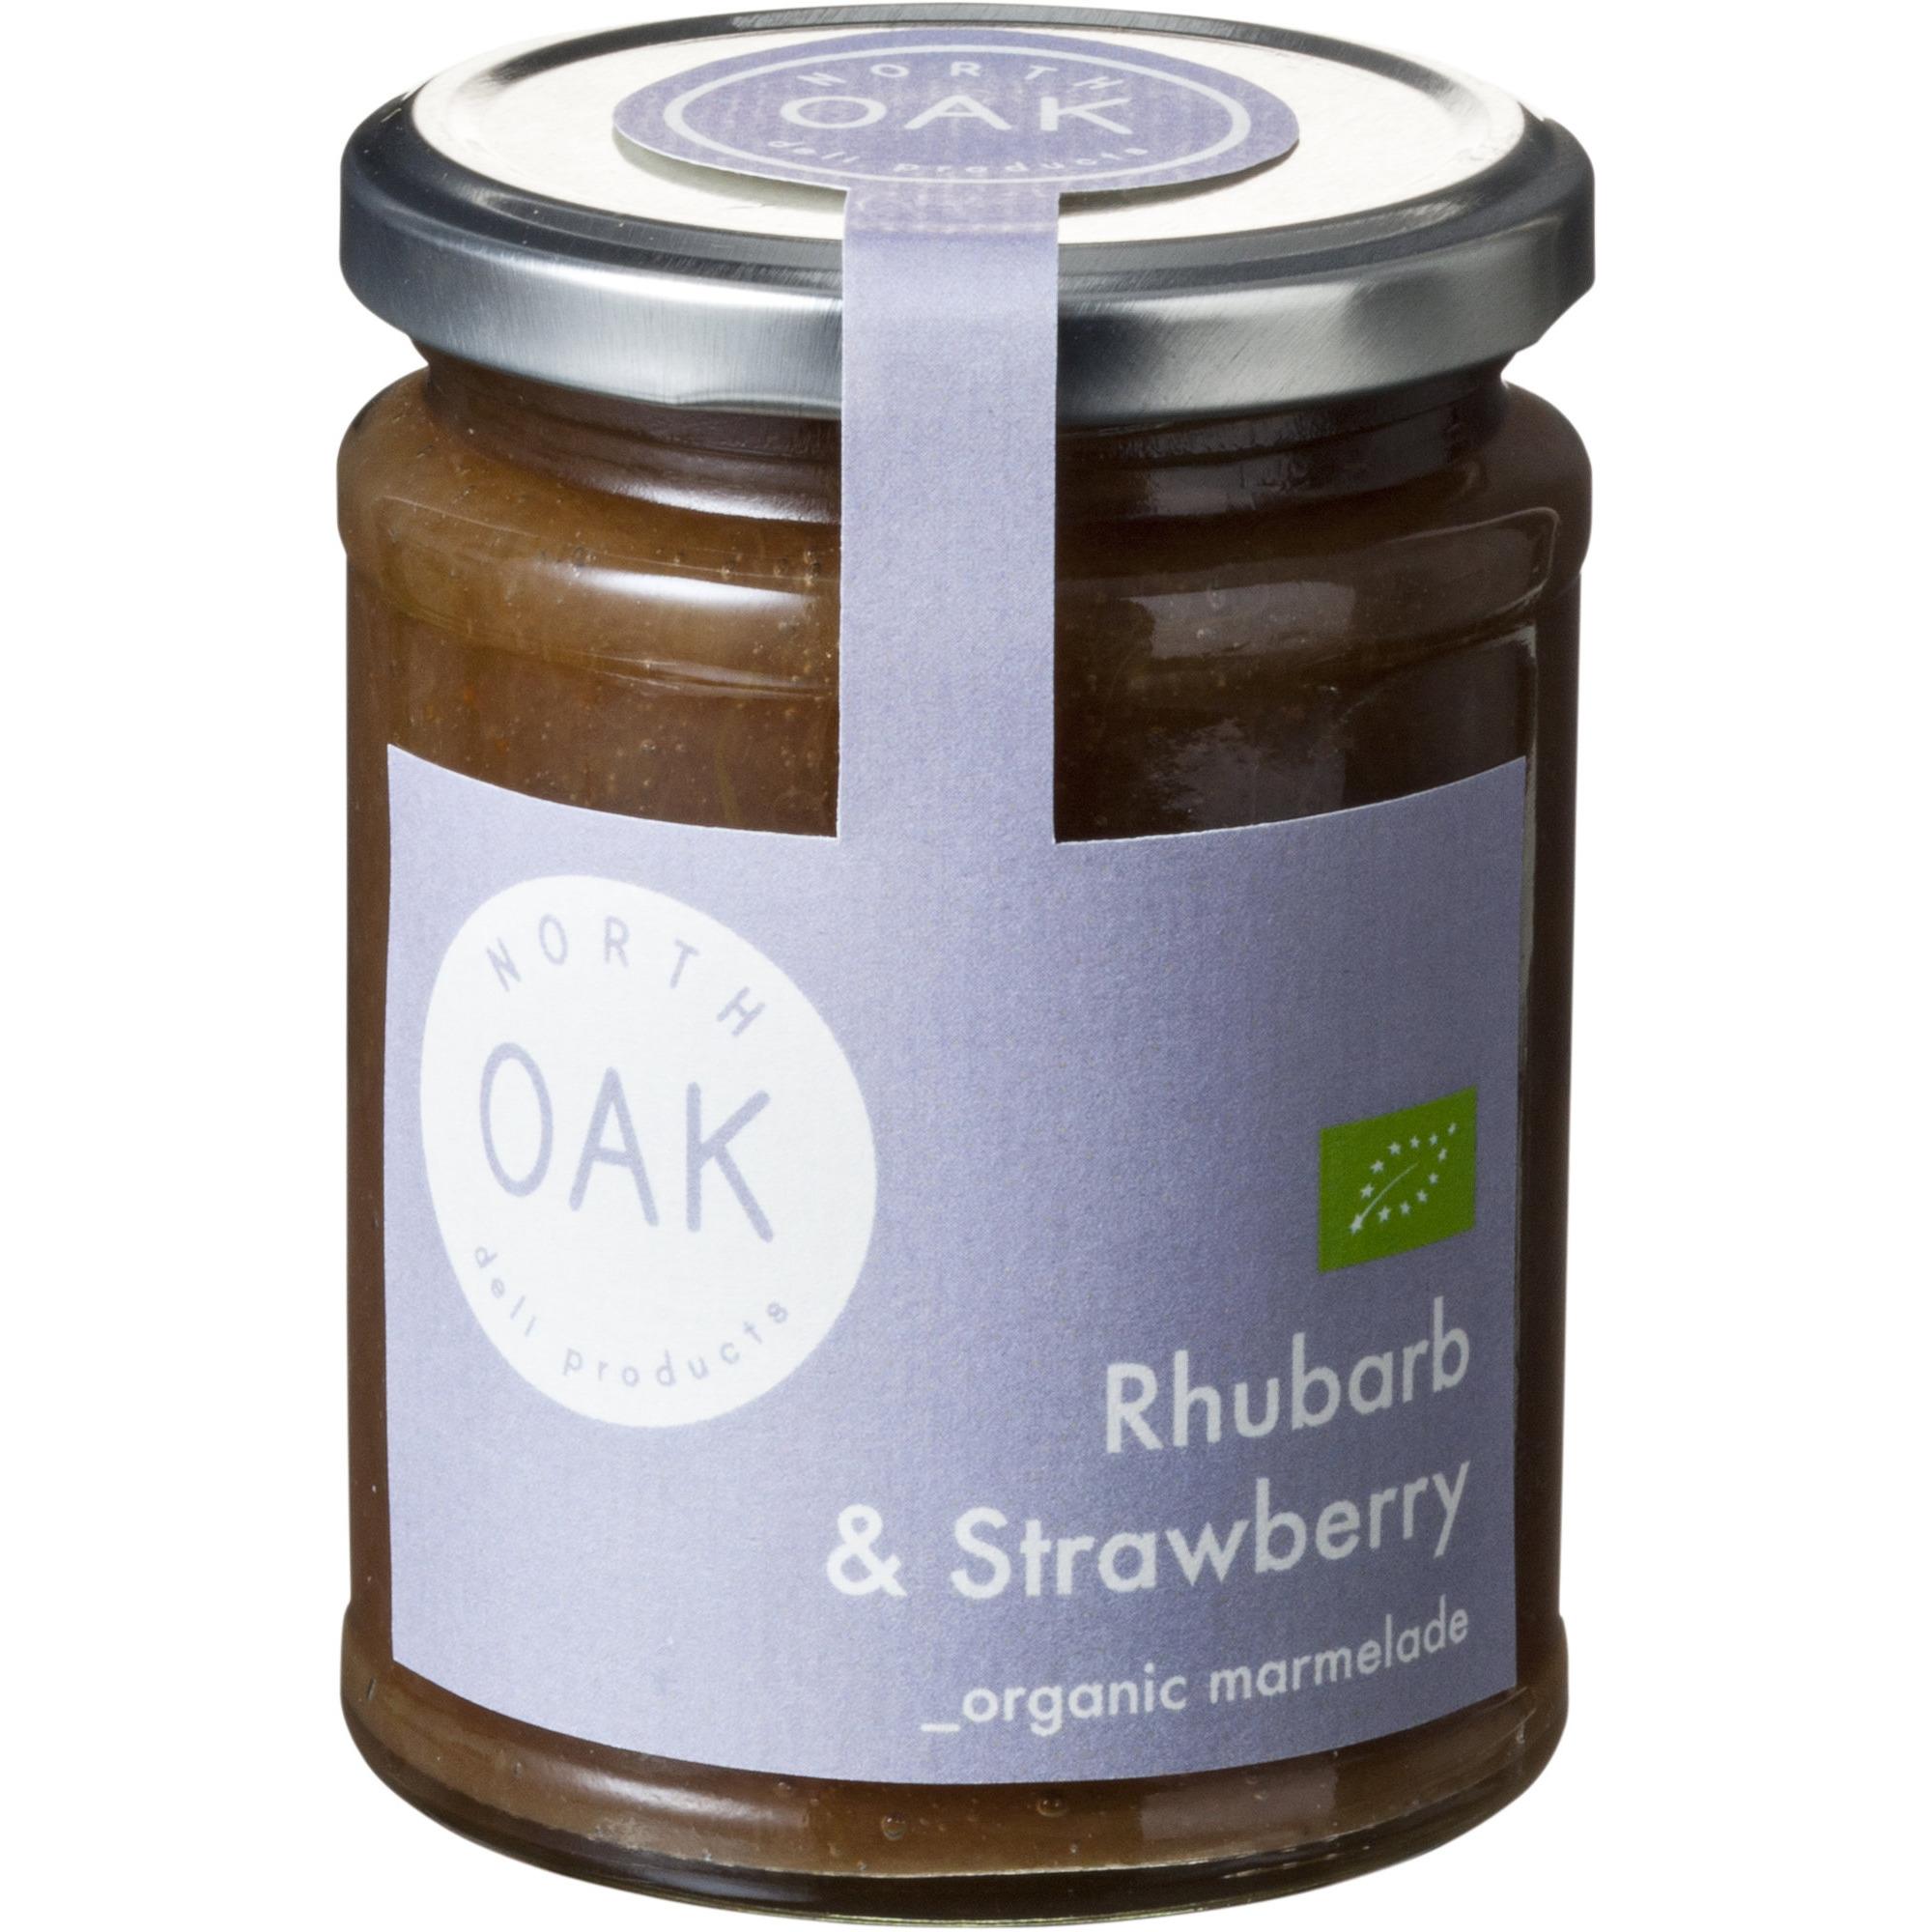 North Oak Rabarber/Jordgubb marmelad